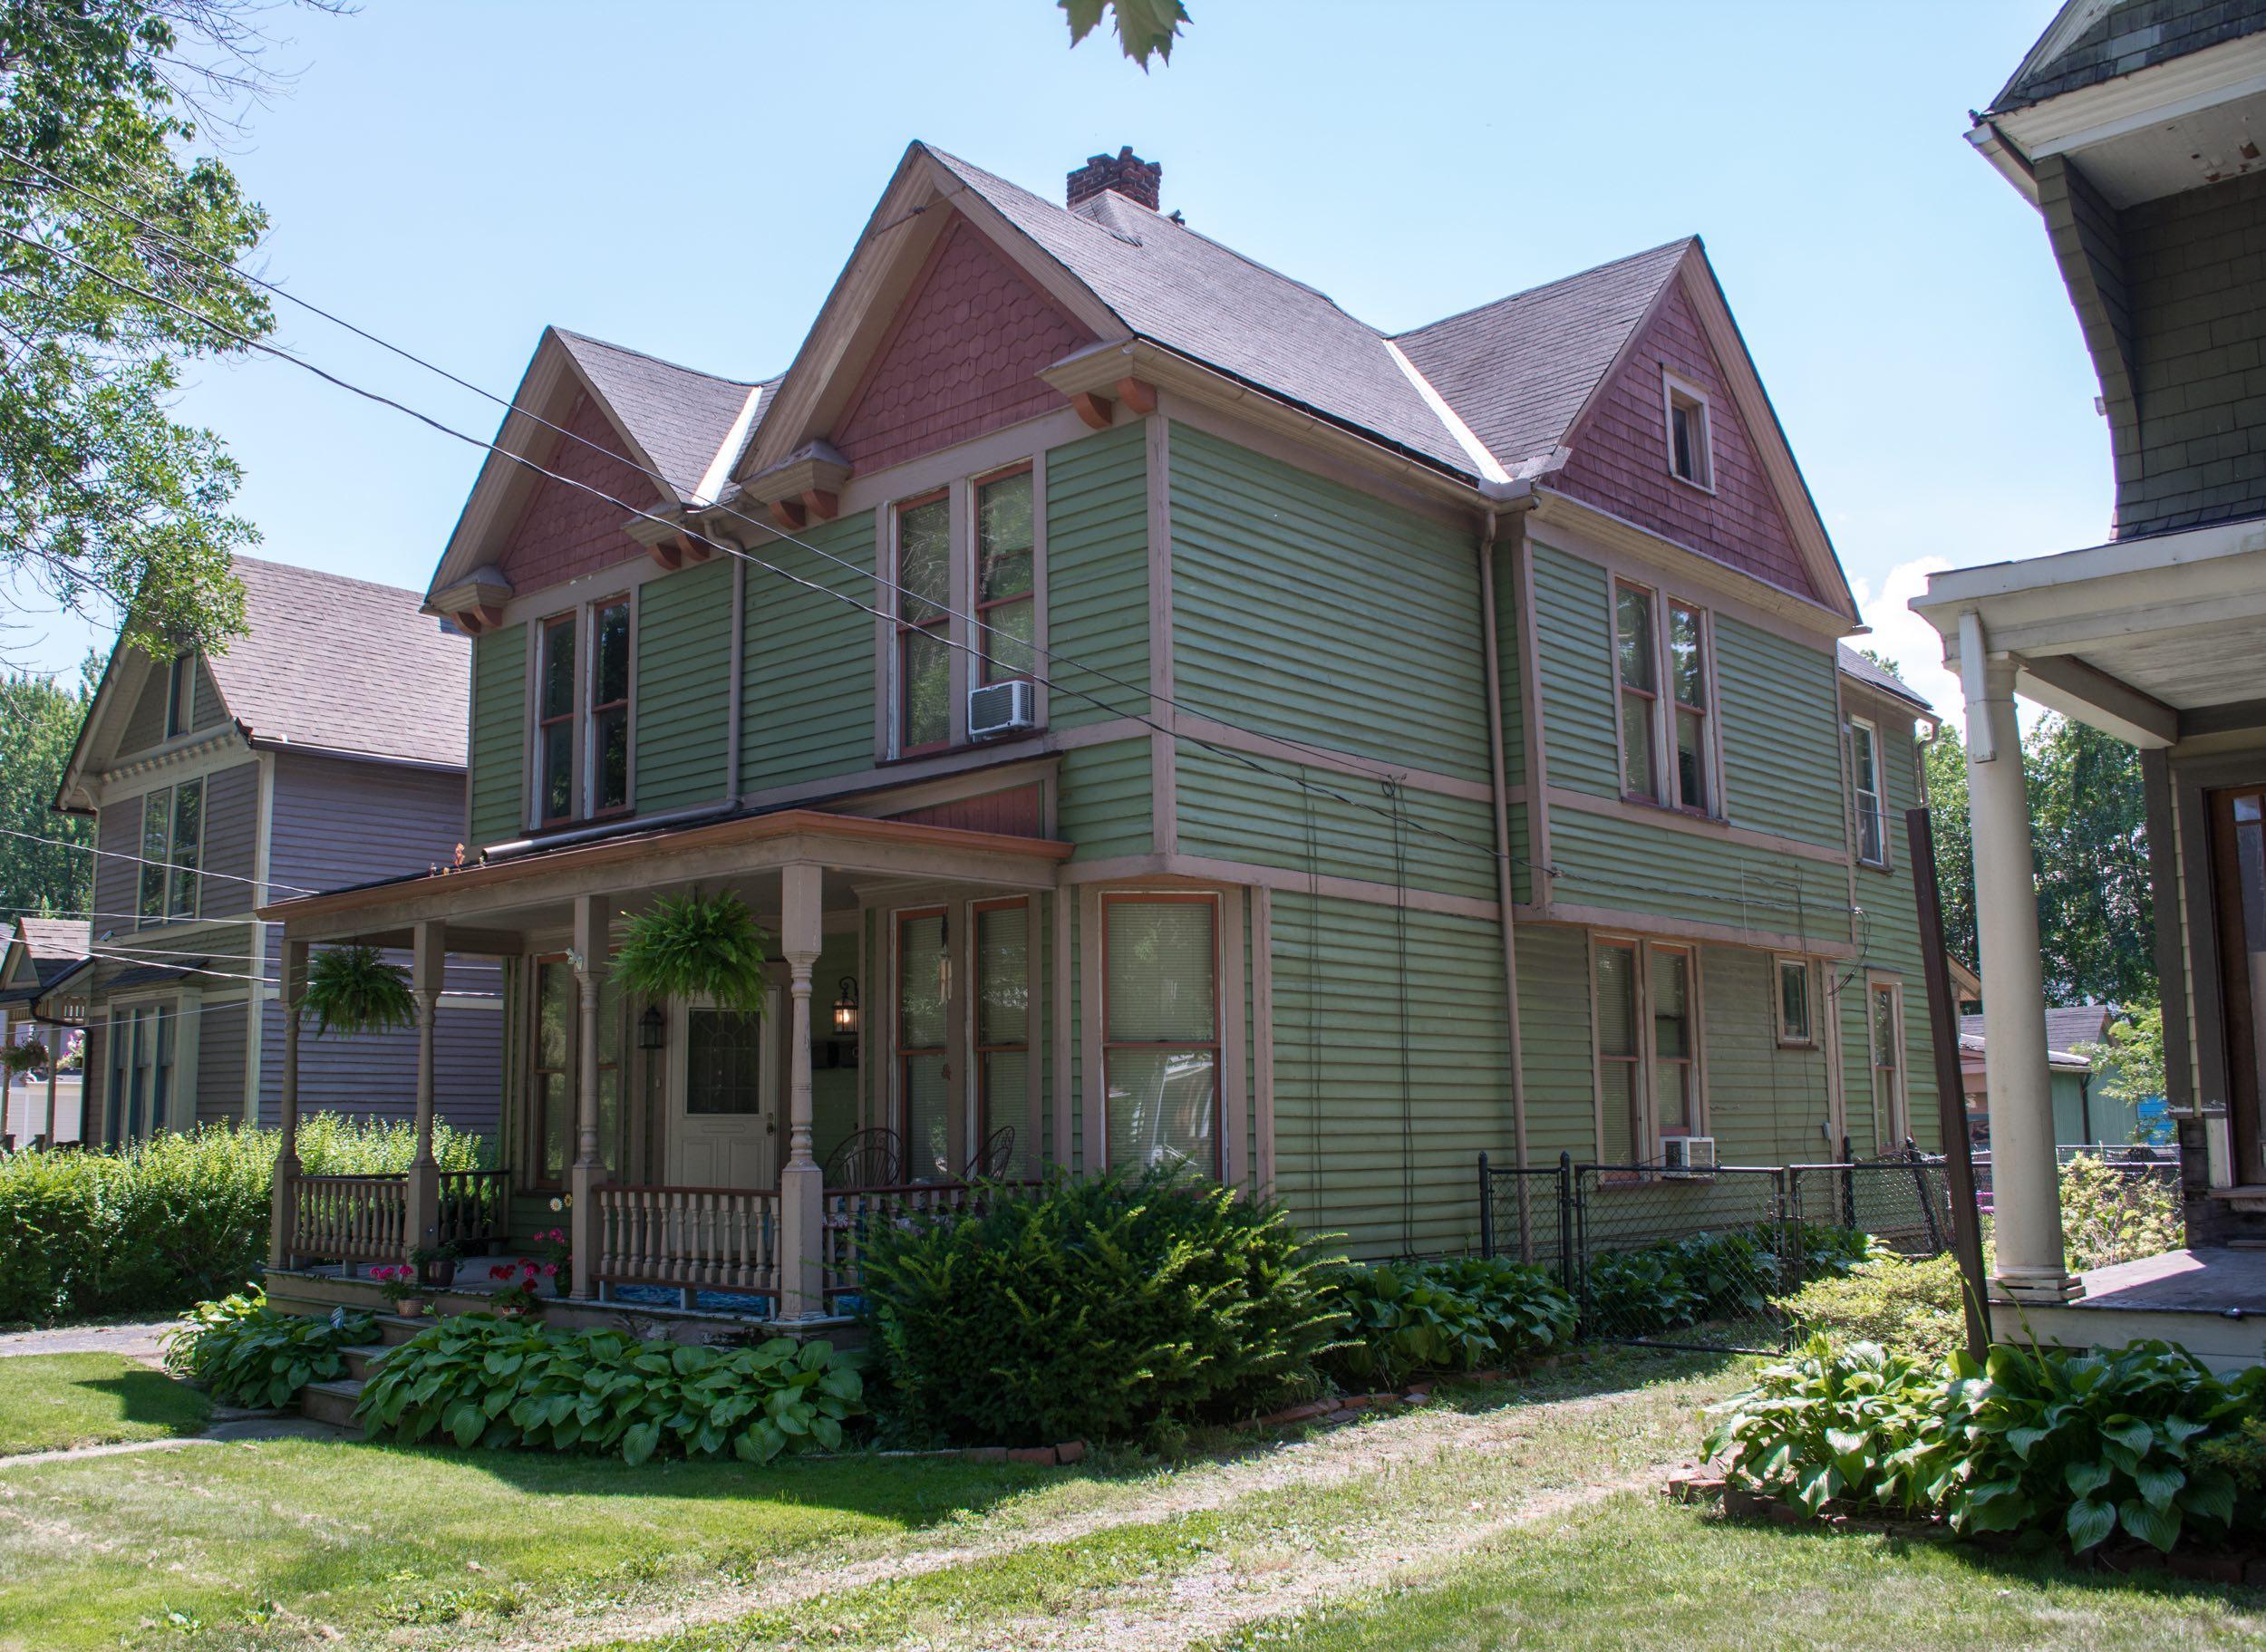 An unobtrusive duplex sits alongside single-family homes. Image via Wikimedia Commons.